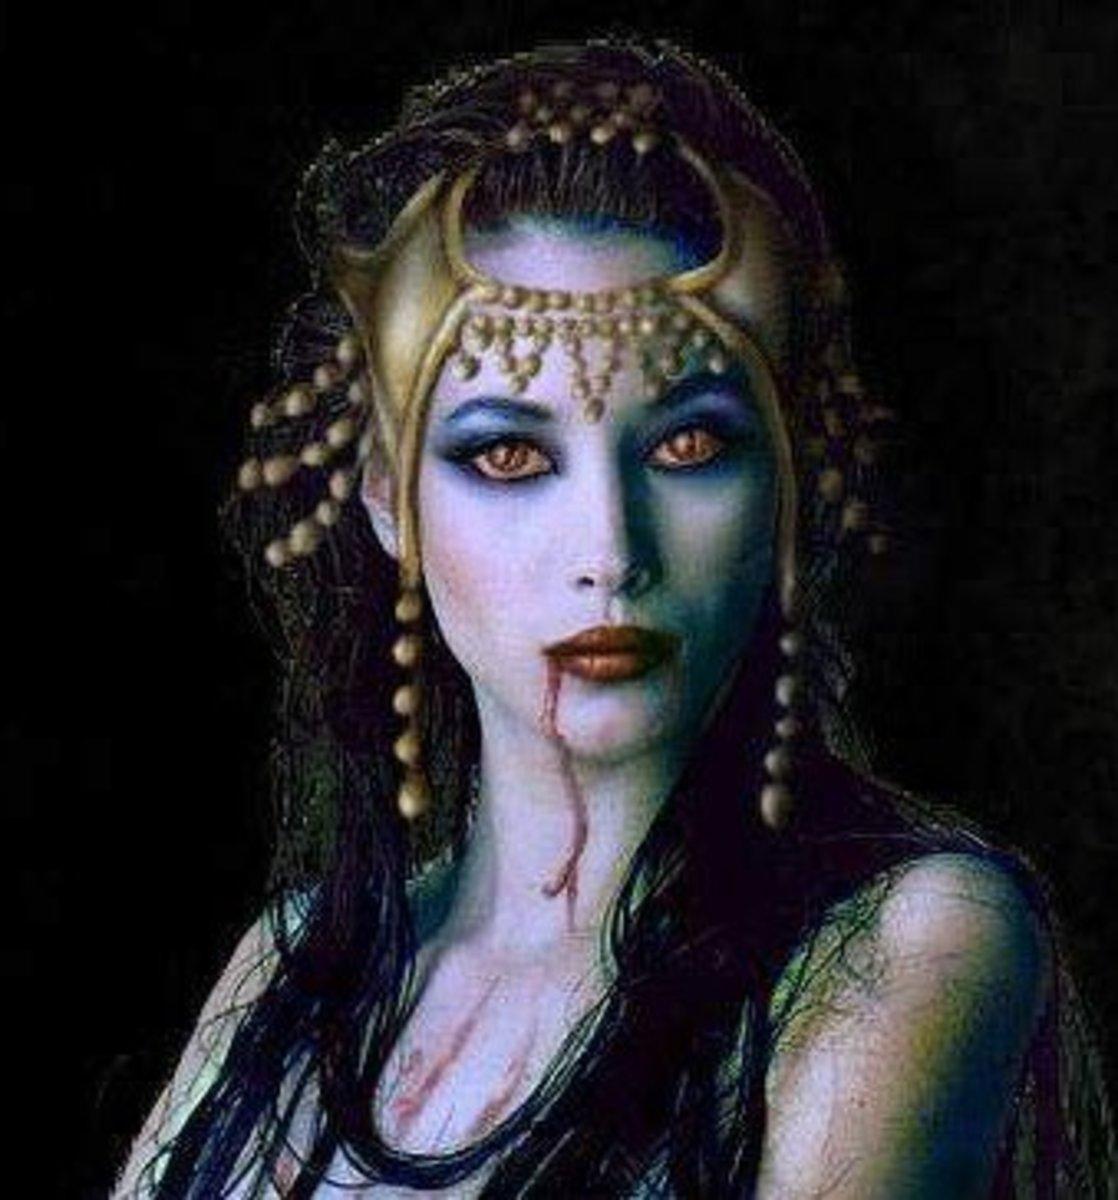 Vampire Makeup Ideas Tutorials Hubpages